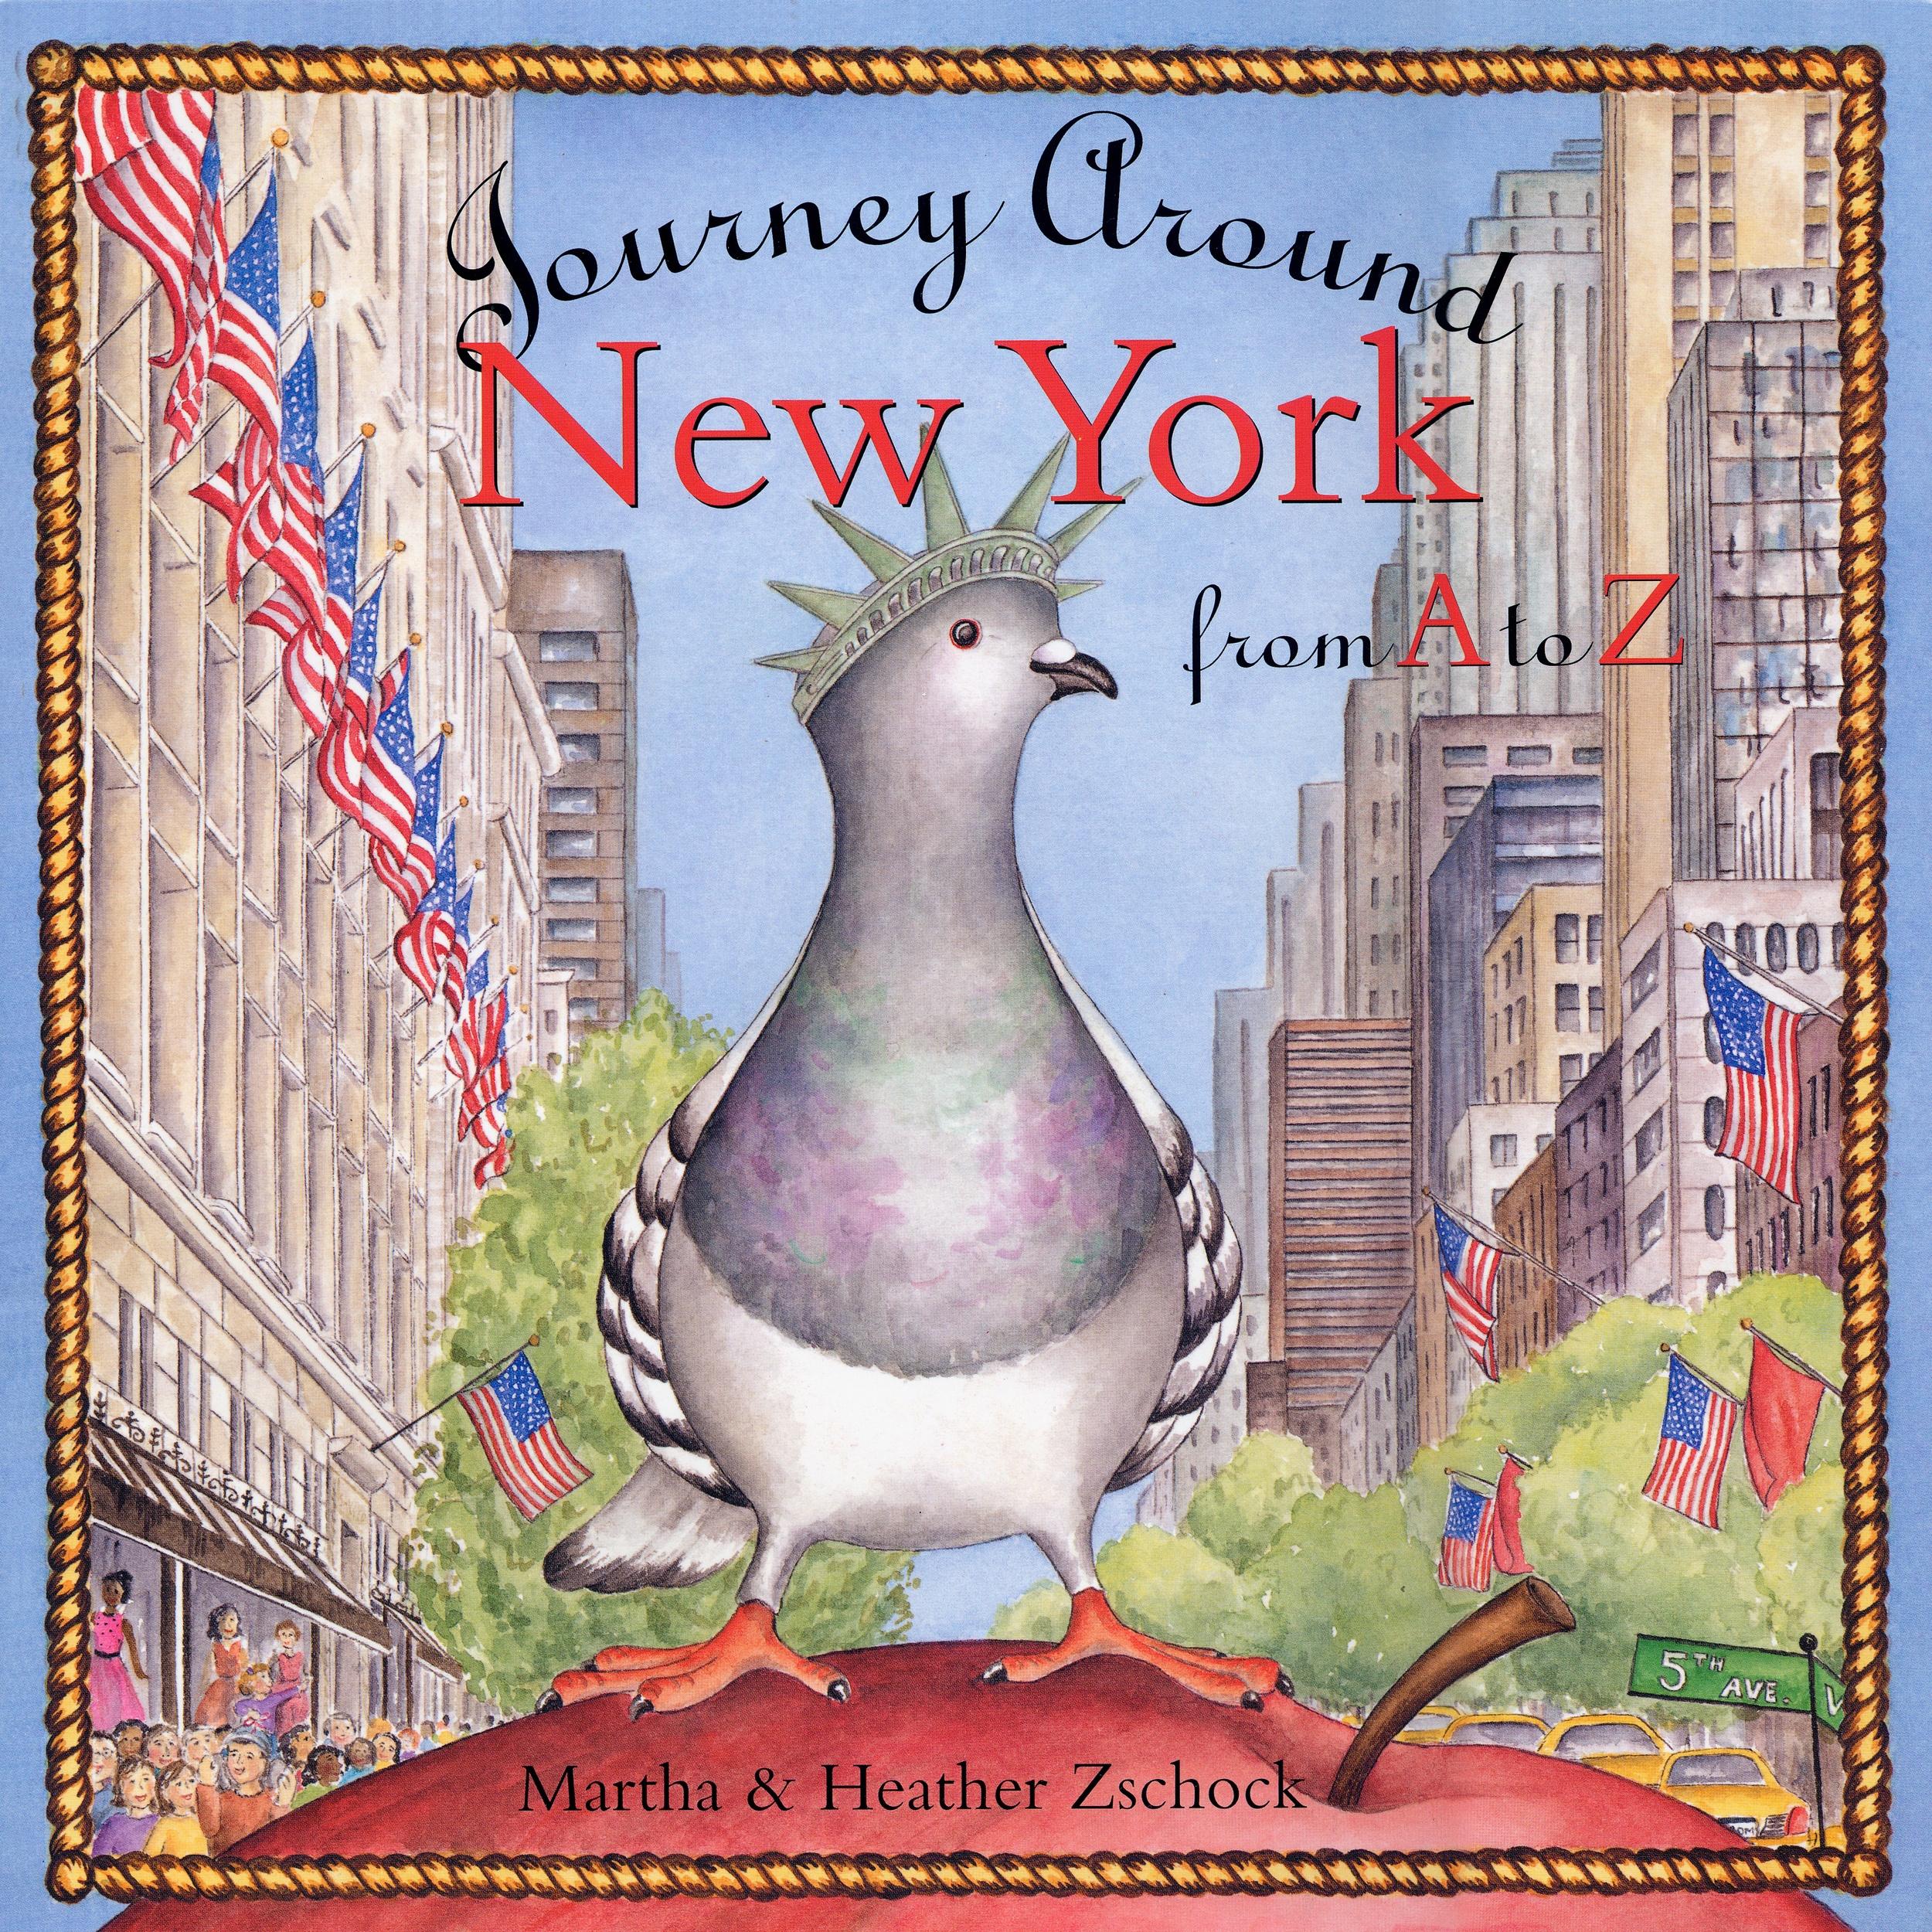 Journey-Around-New-York